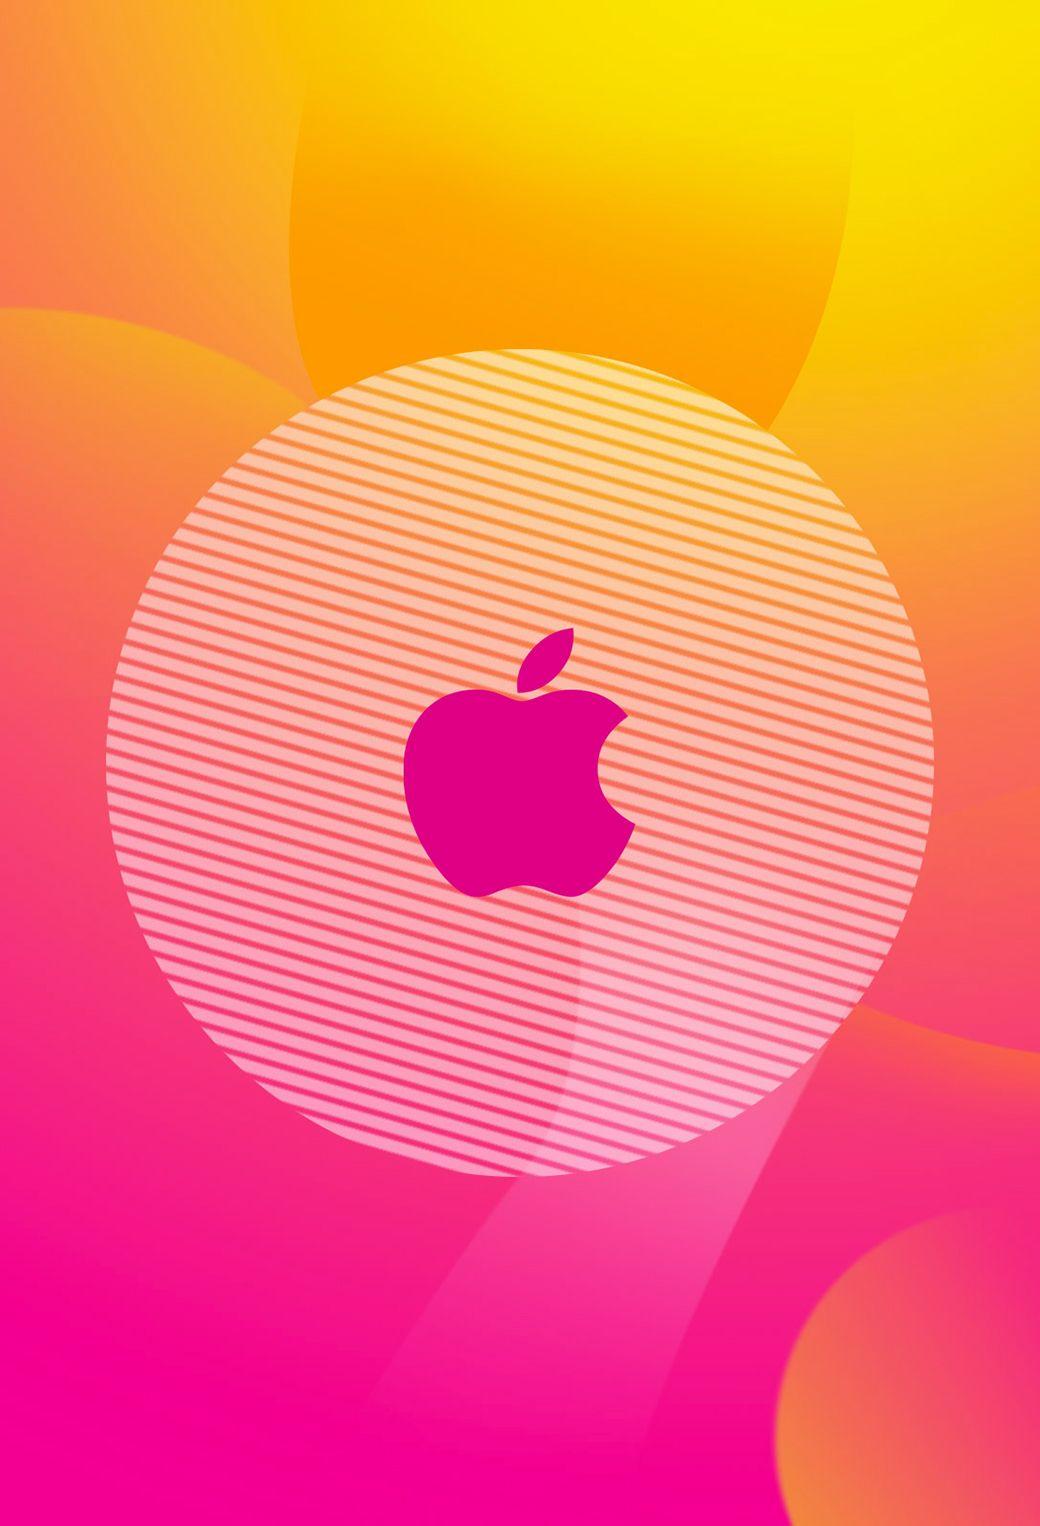 Wallpaper quiksilver iphone 5 - Apple Turquoise Wall Peper Bing Images Iphone Backgroundsiphone Wallpapersblack